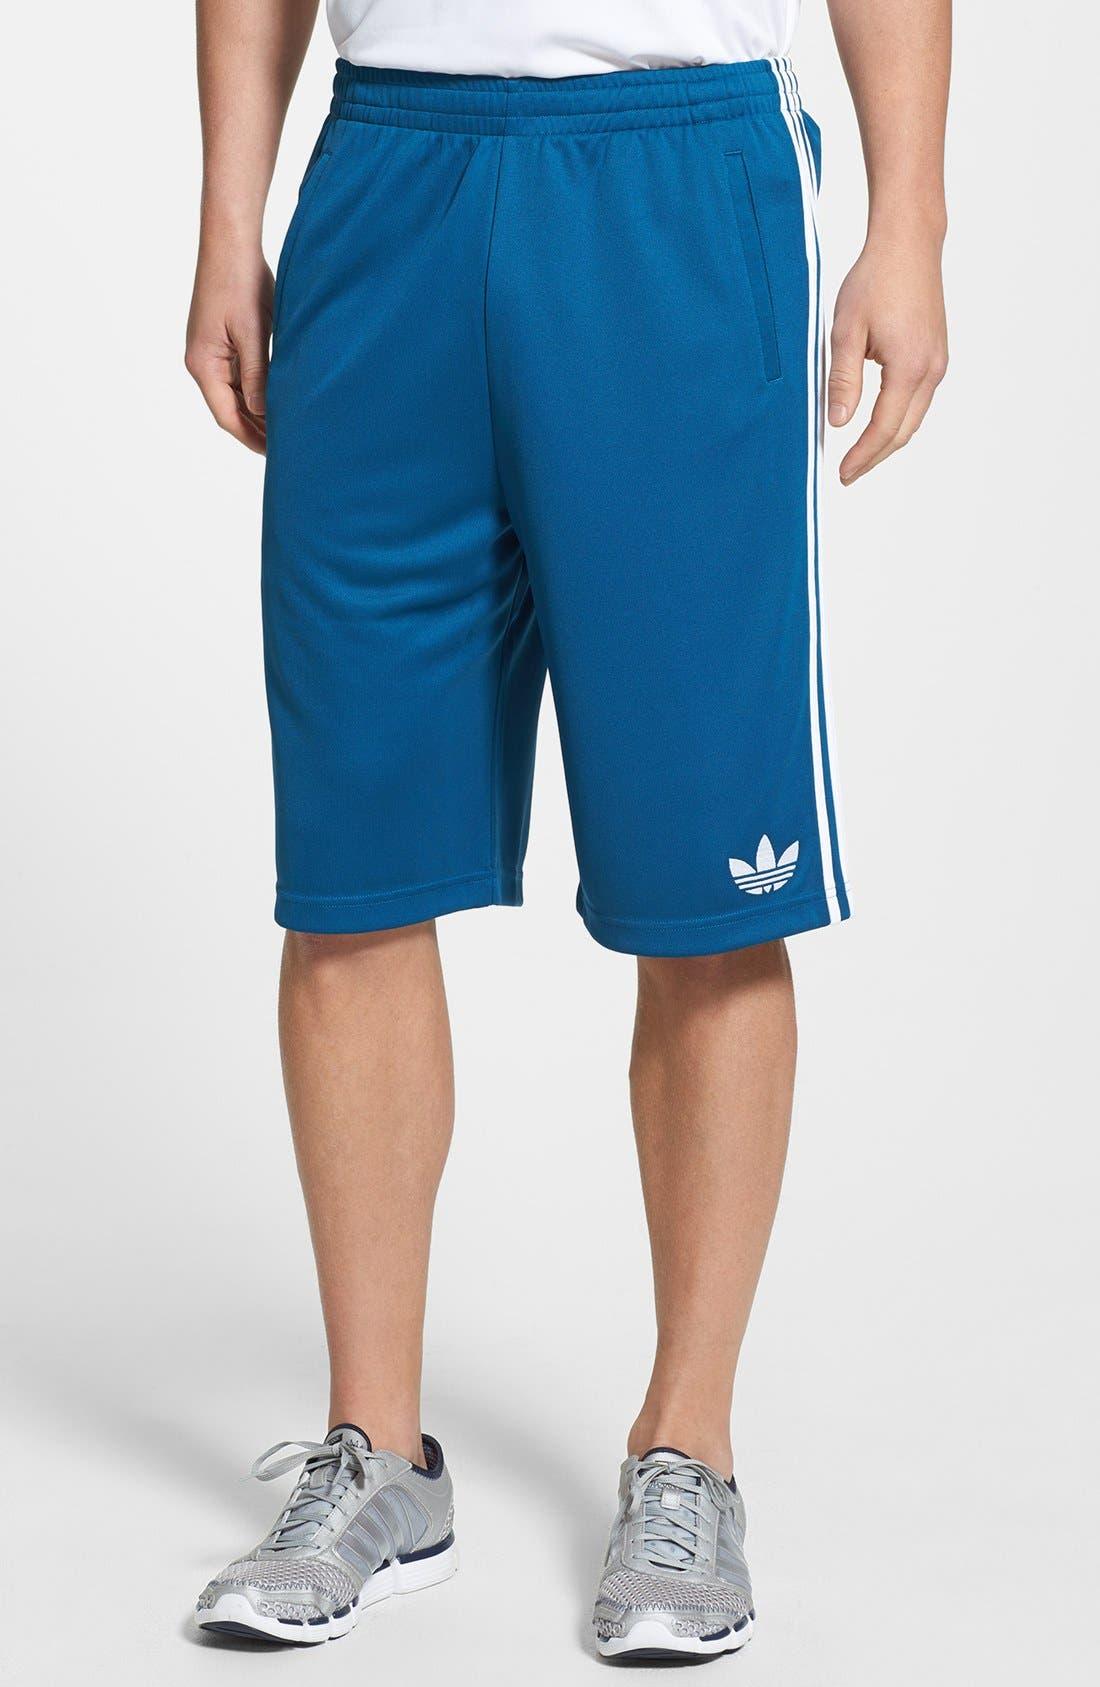 Main Image - adidas Originals 'Heritage' Shorts